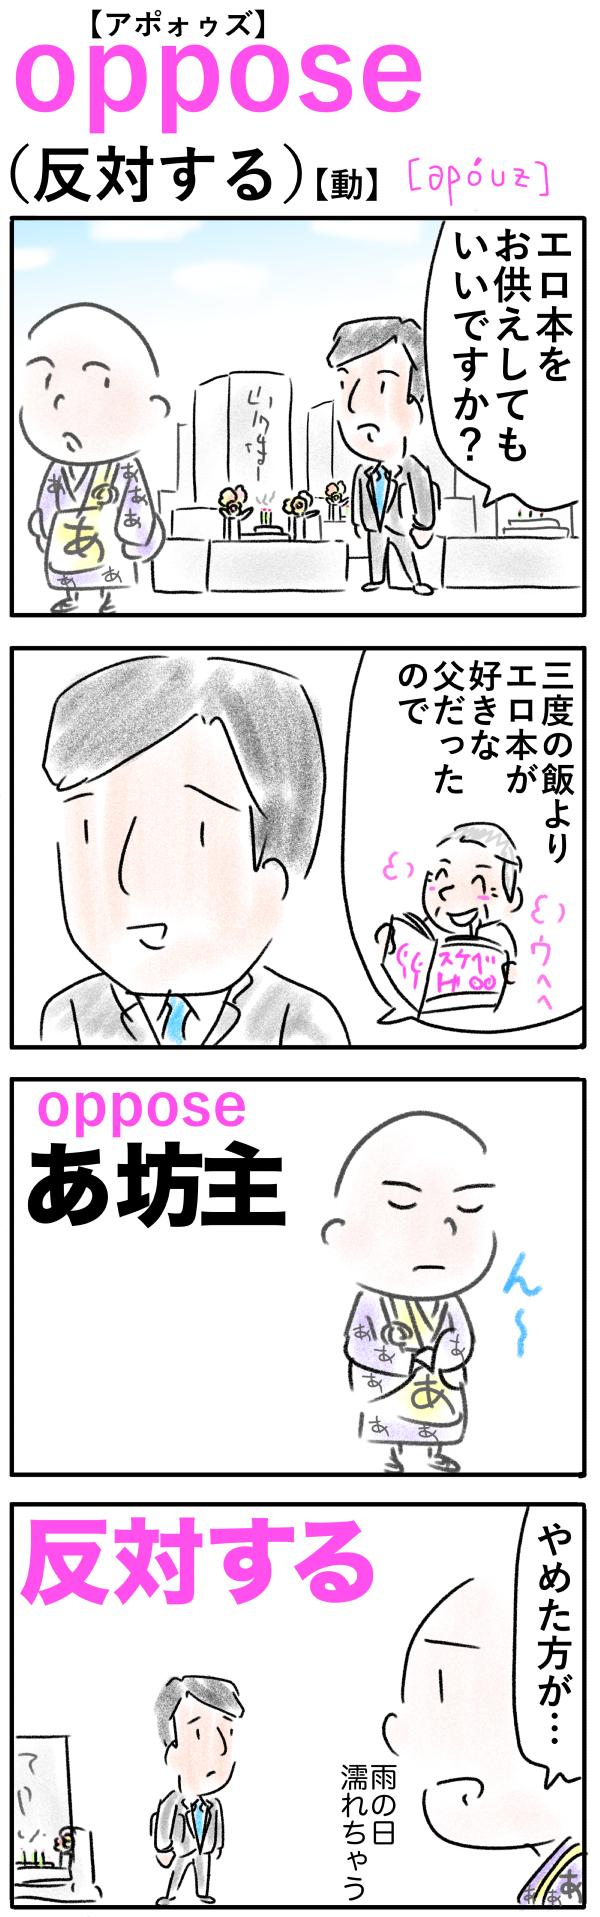 oppose(反対する)の語呂合わせ英単語